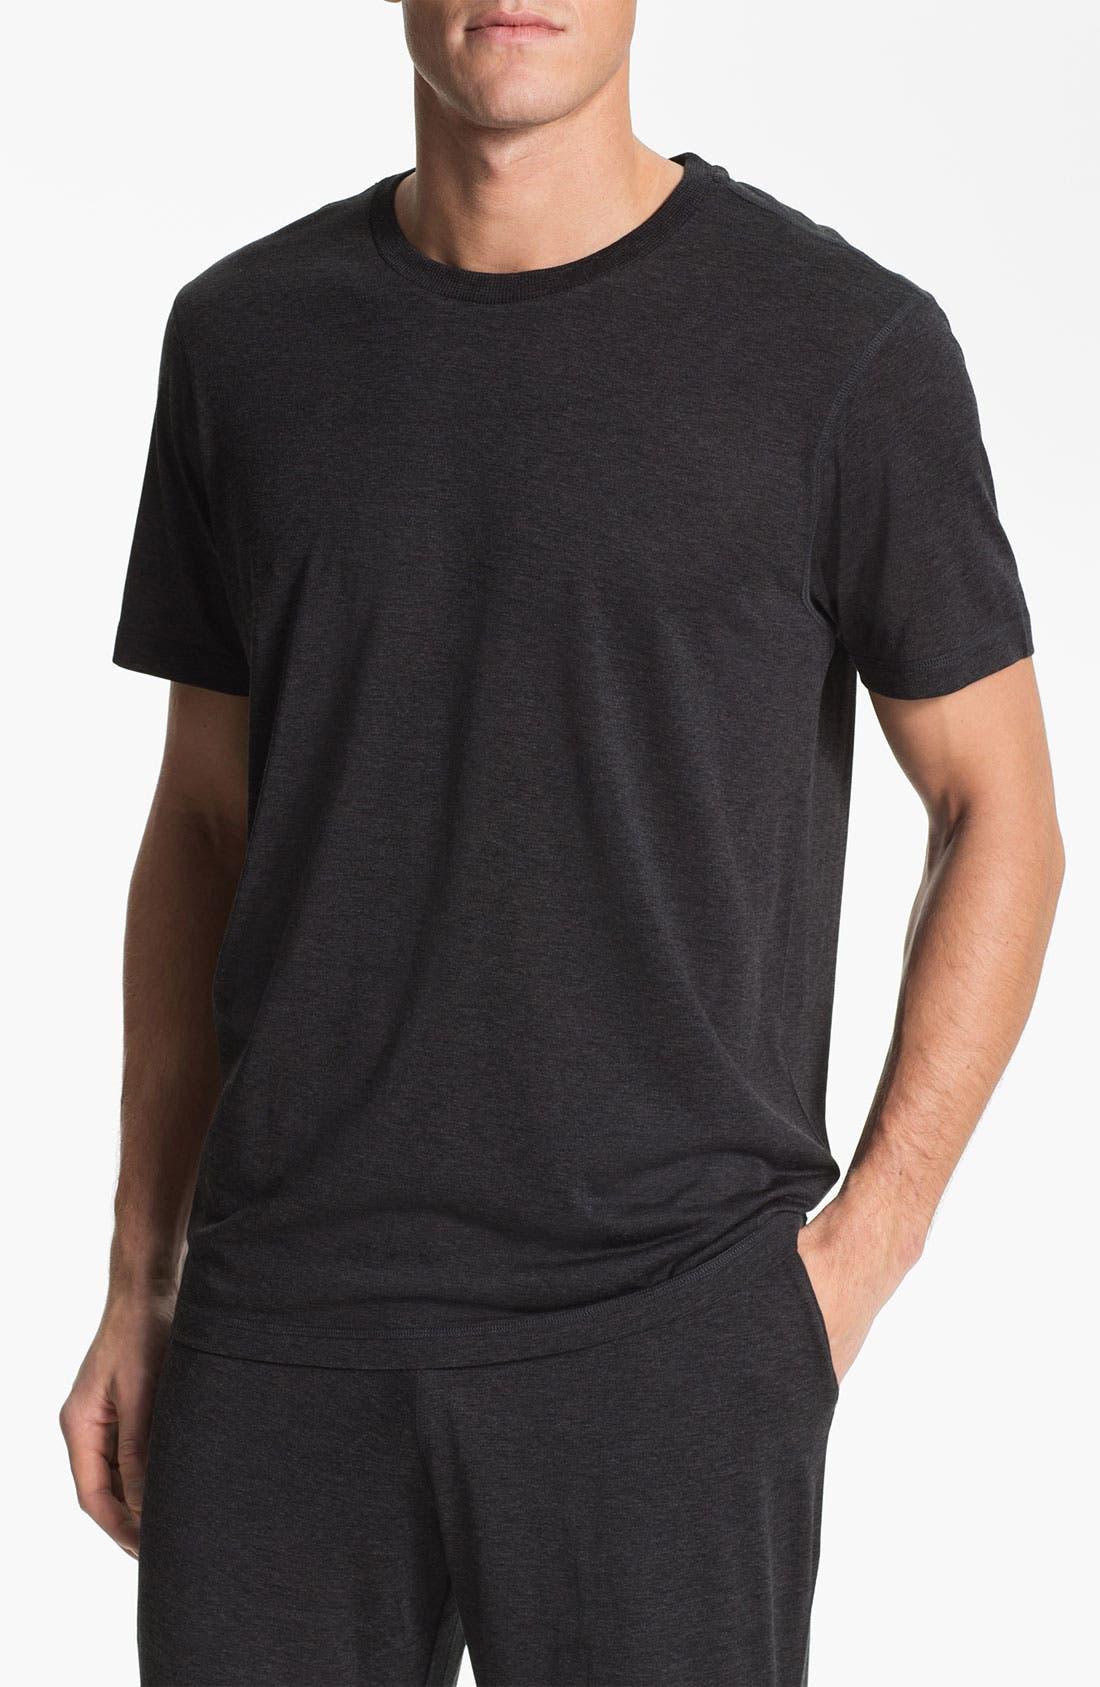 Alternate Image 1 Selected - Daniel Buchler Silk & Cotton T-Shirt